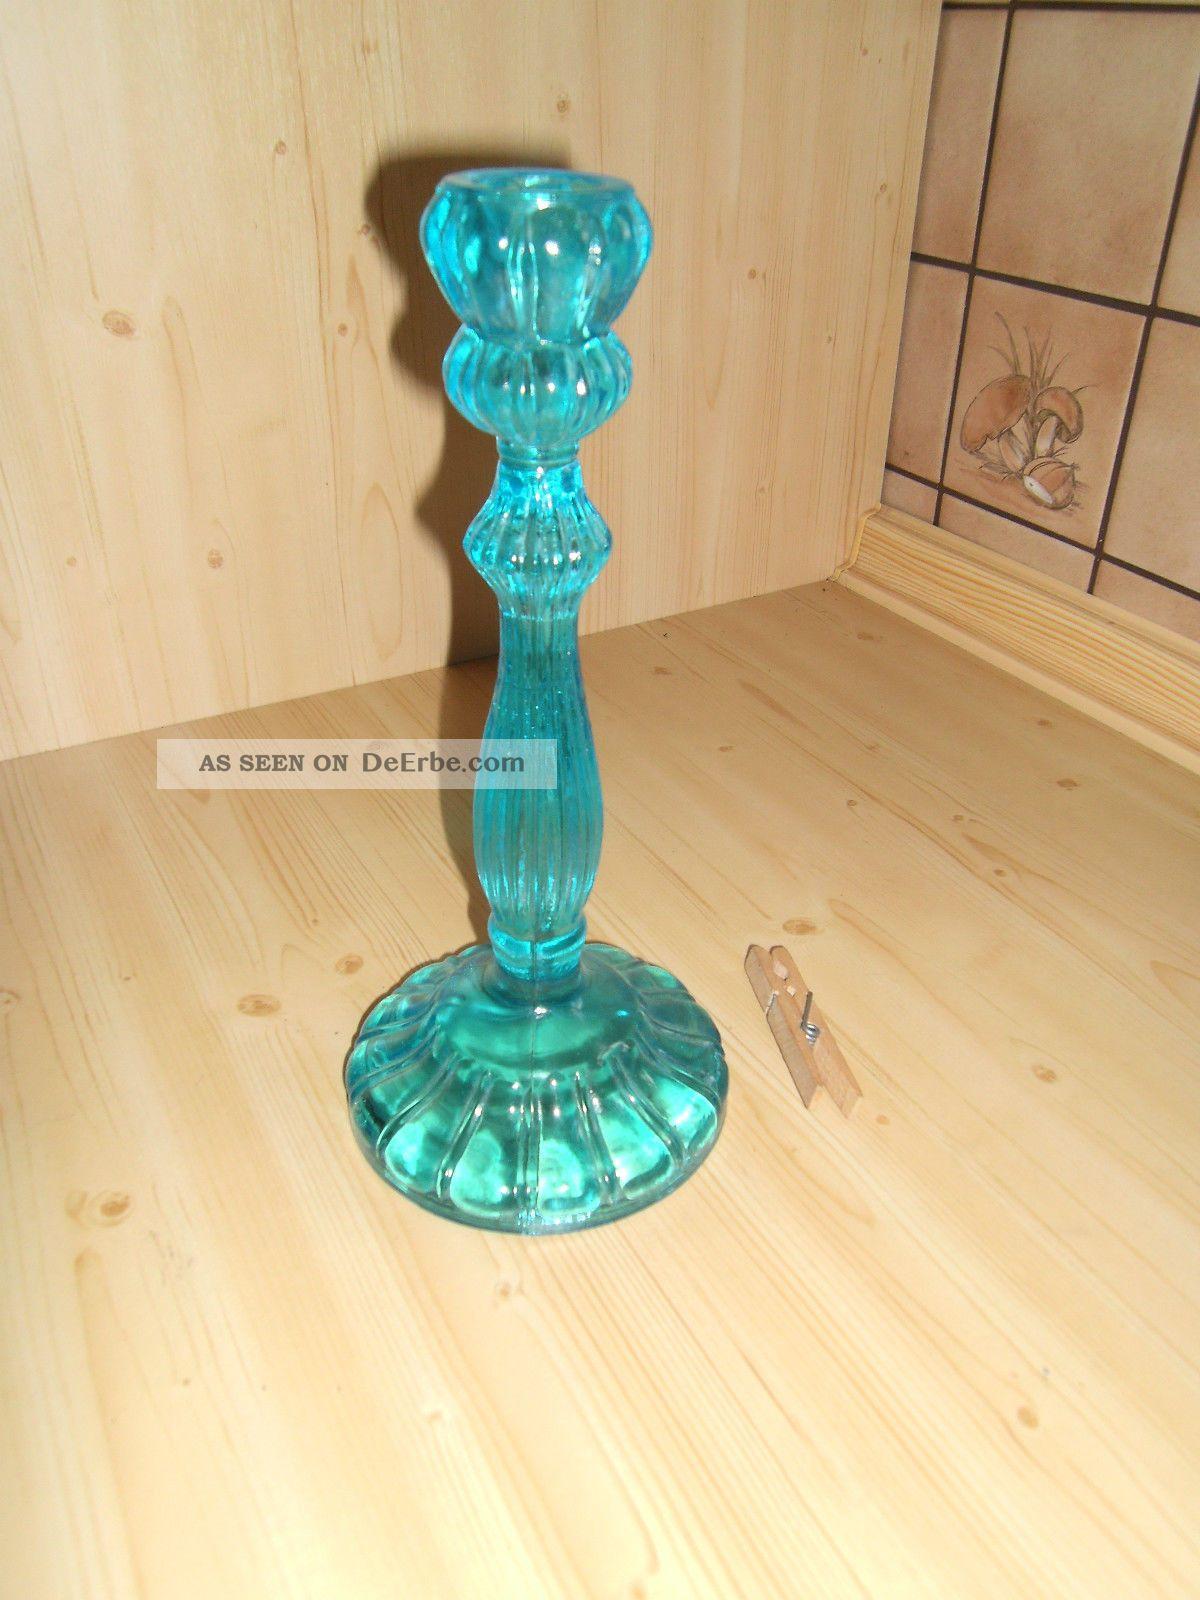 1 Antiker Kerzenständer,  Kerzenhalter,  Kerzenleuchter Pressglas Türkis Top Zust. Kristall Bild